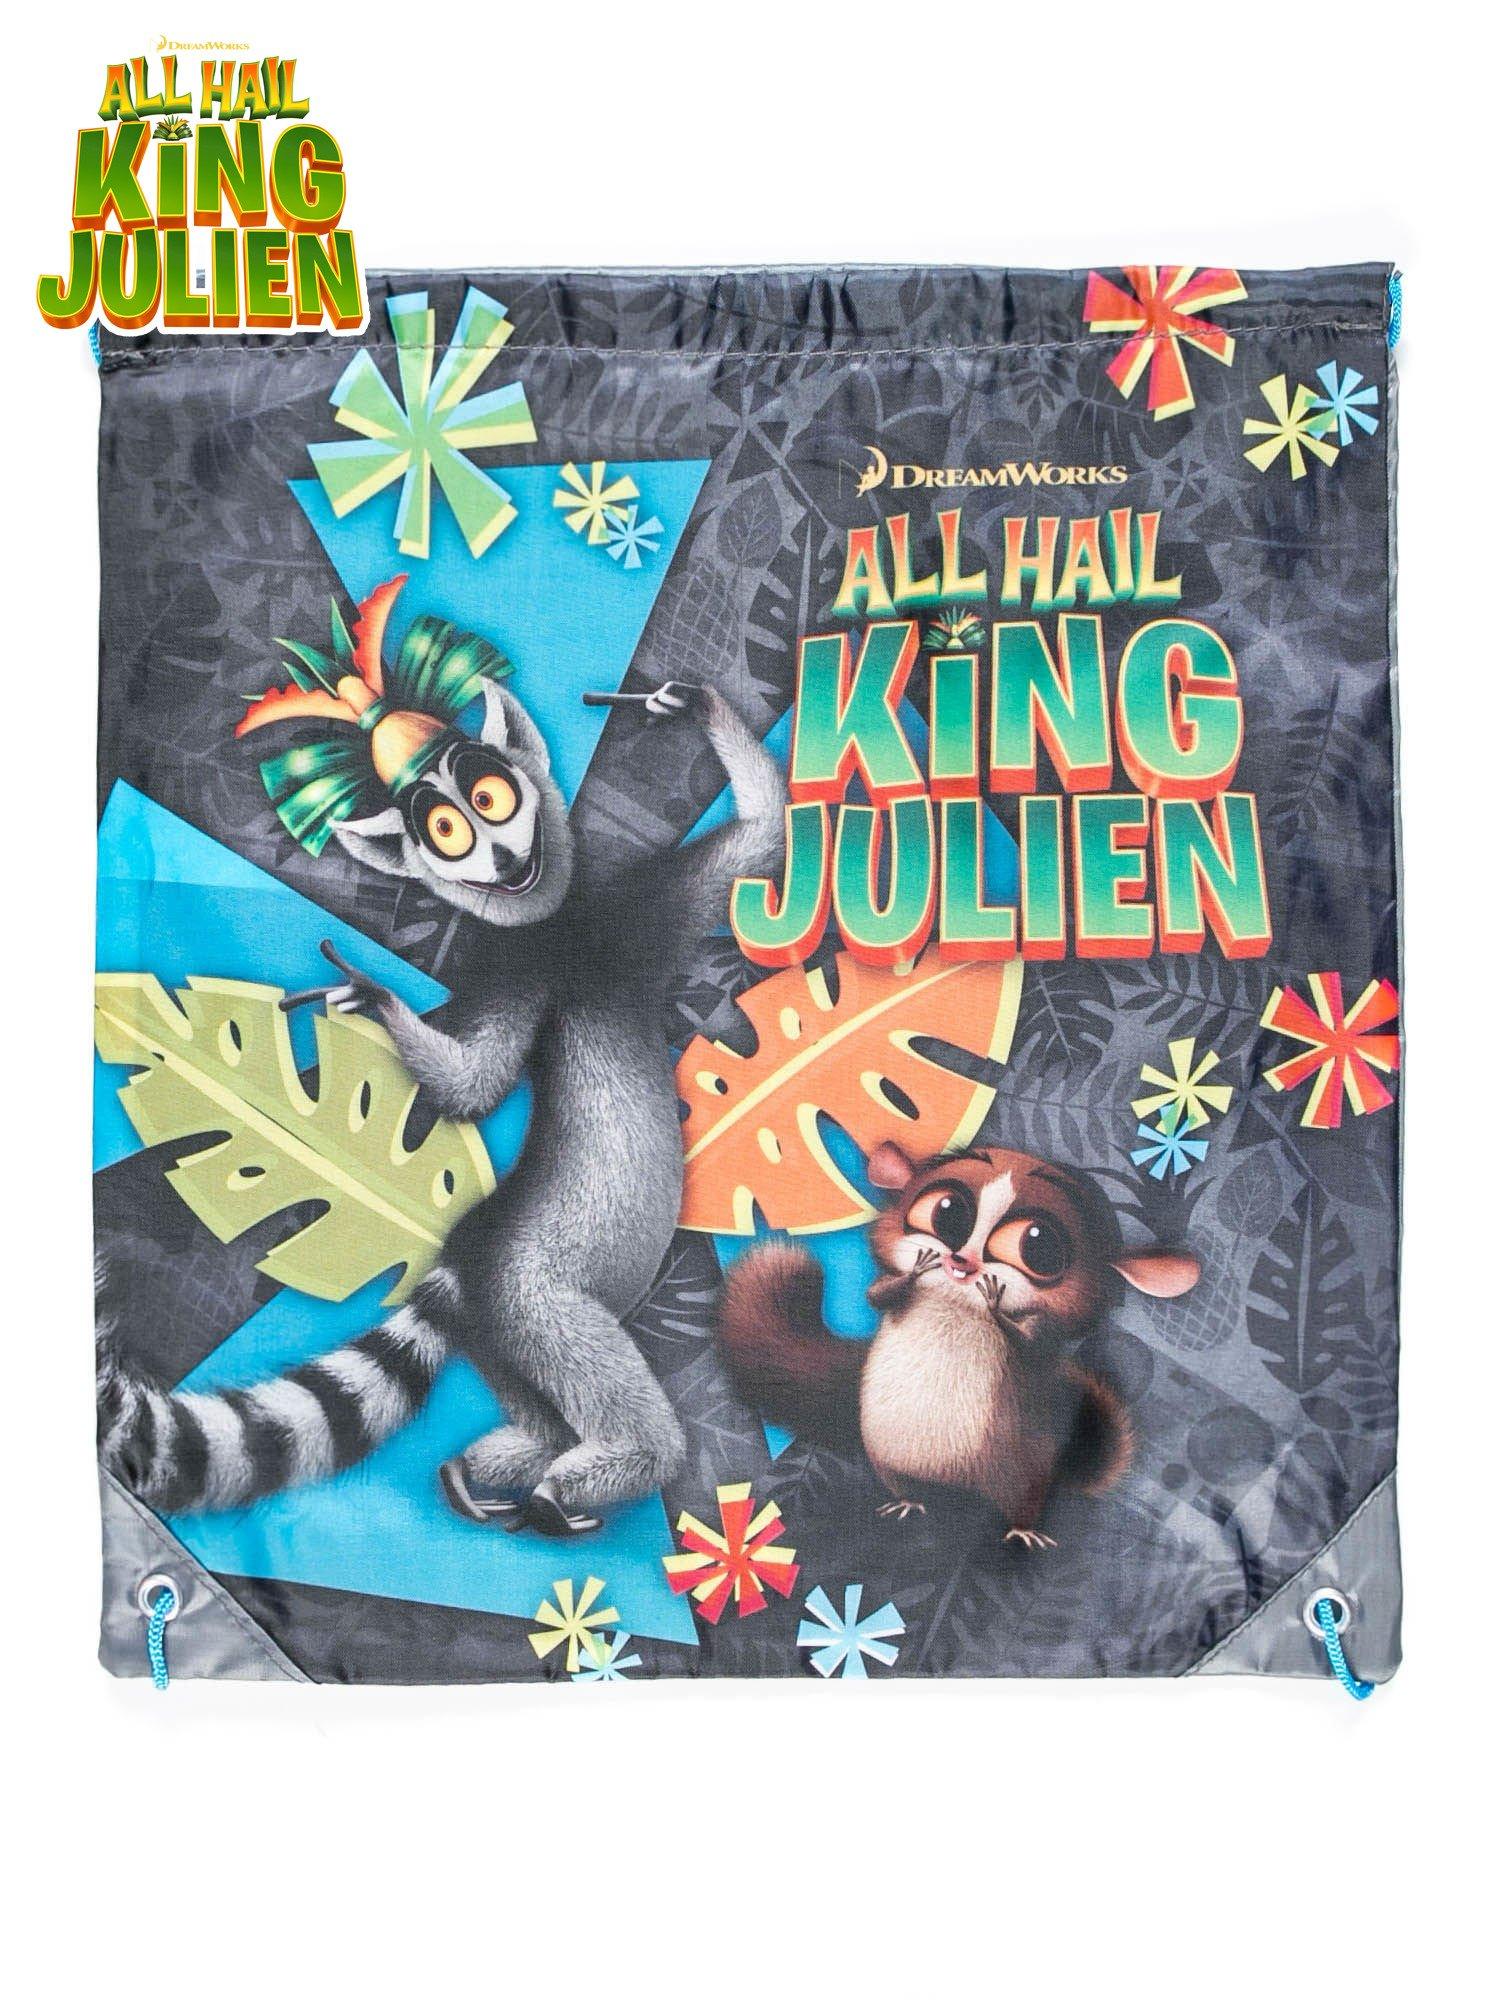 Plecak typu worek z motywem ALL HAIL KING JULIEN